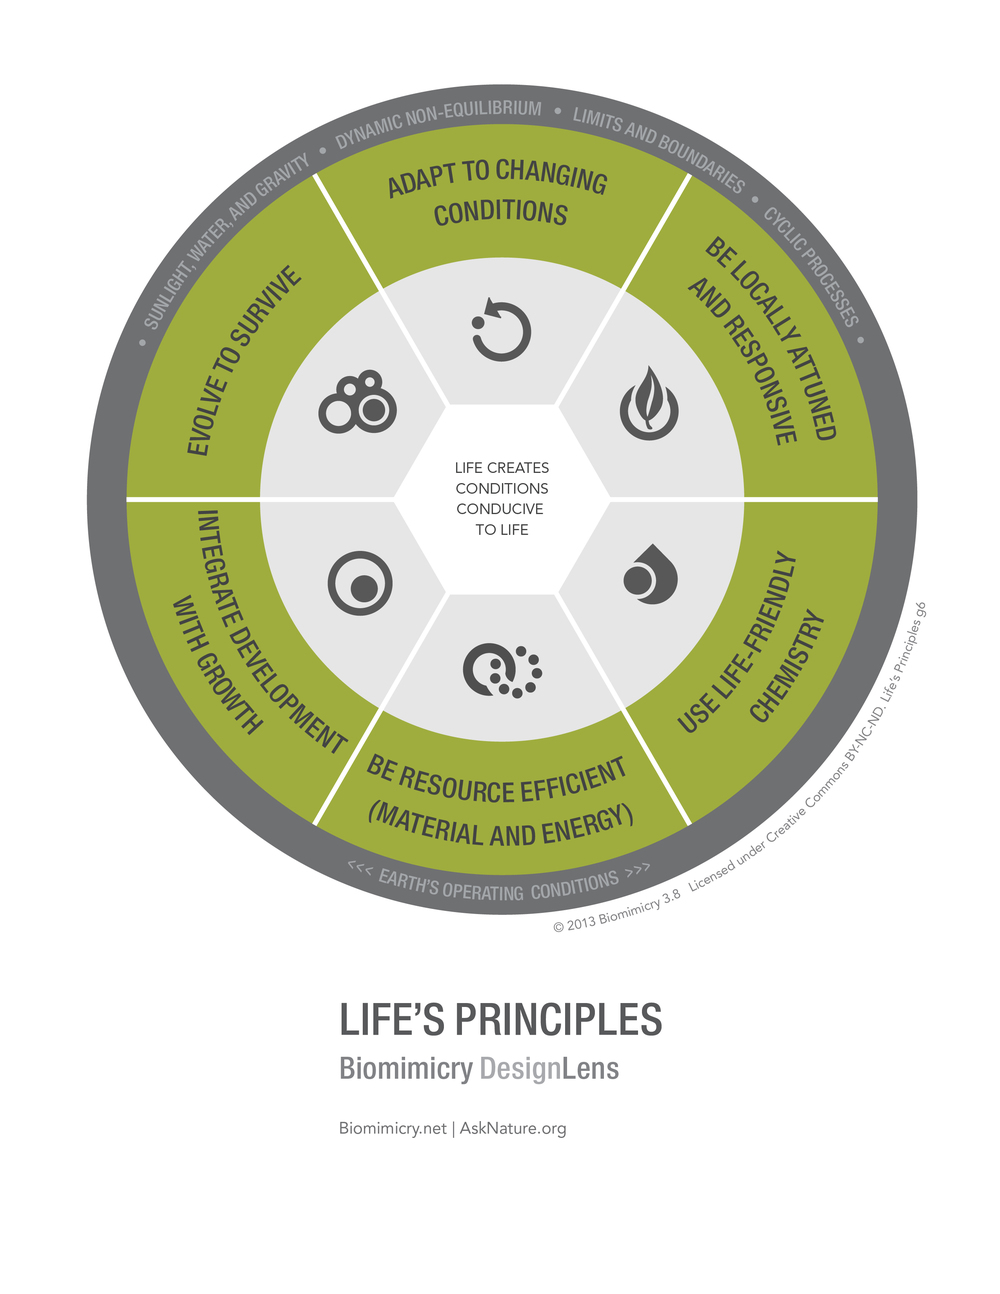 Biomimicry38_DesignLens_Lifes_Principles_Top6_WEB.jpg